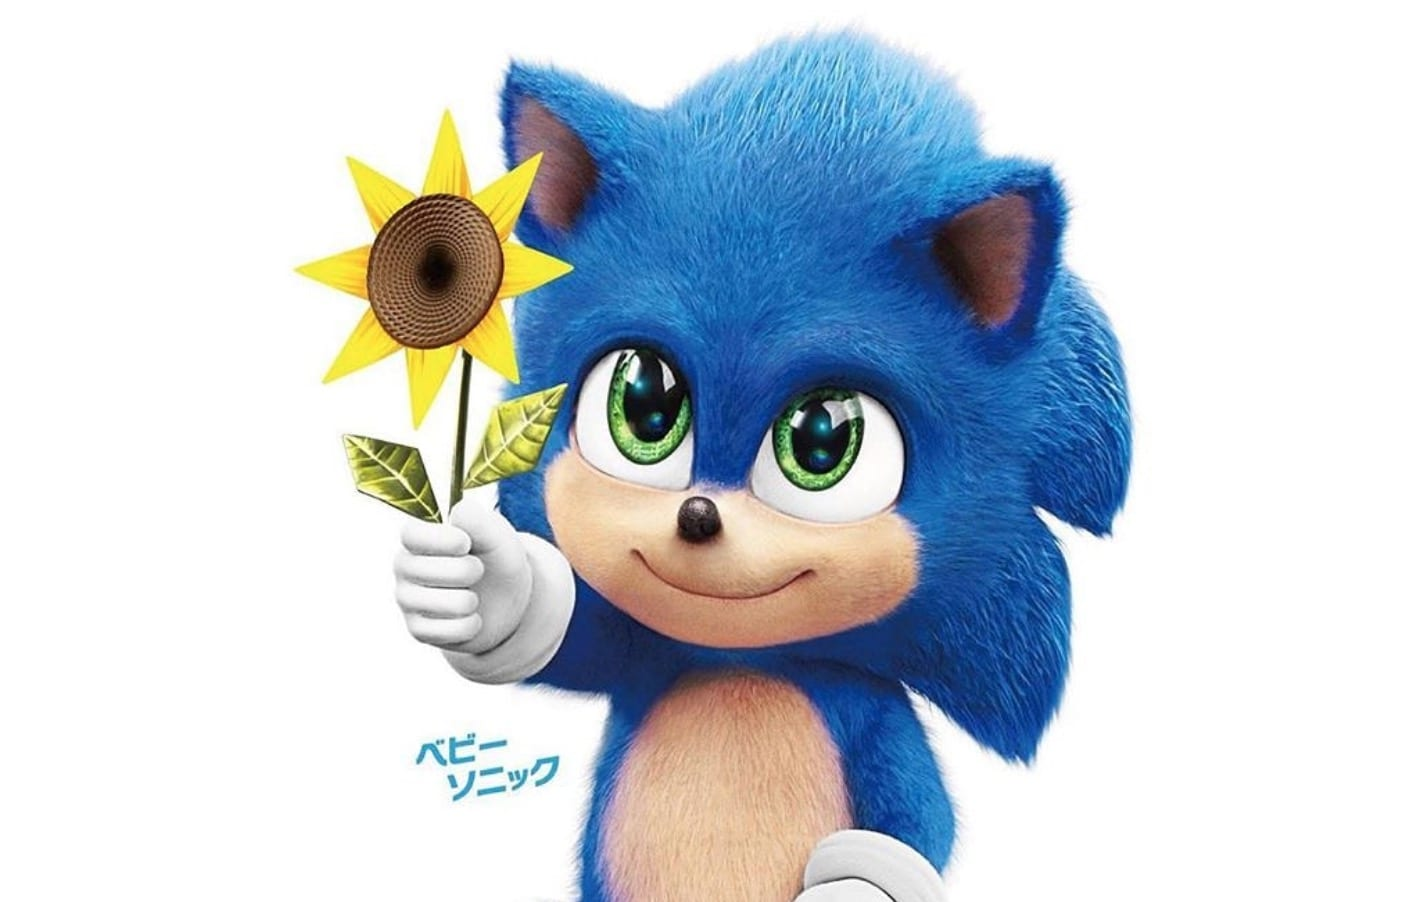 baby sonic the hedgehog